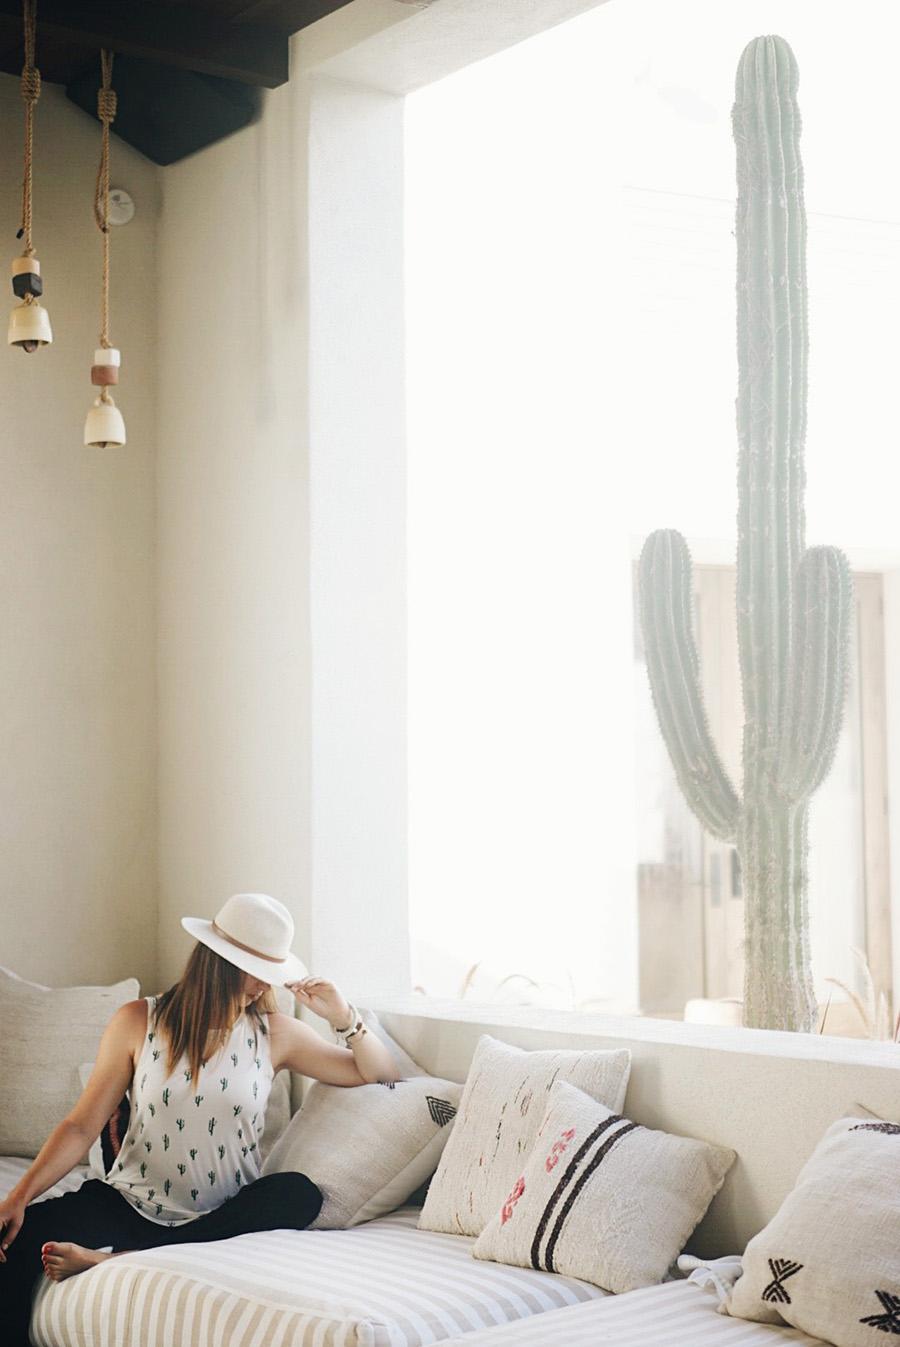 Meg Sexton Photography, Todos Santos, Baja California, Hotel San Cristobal